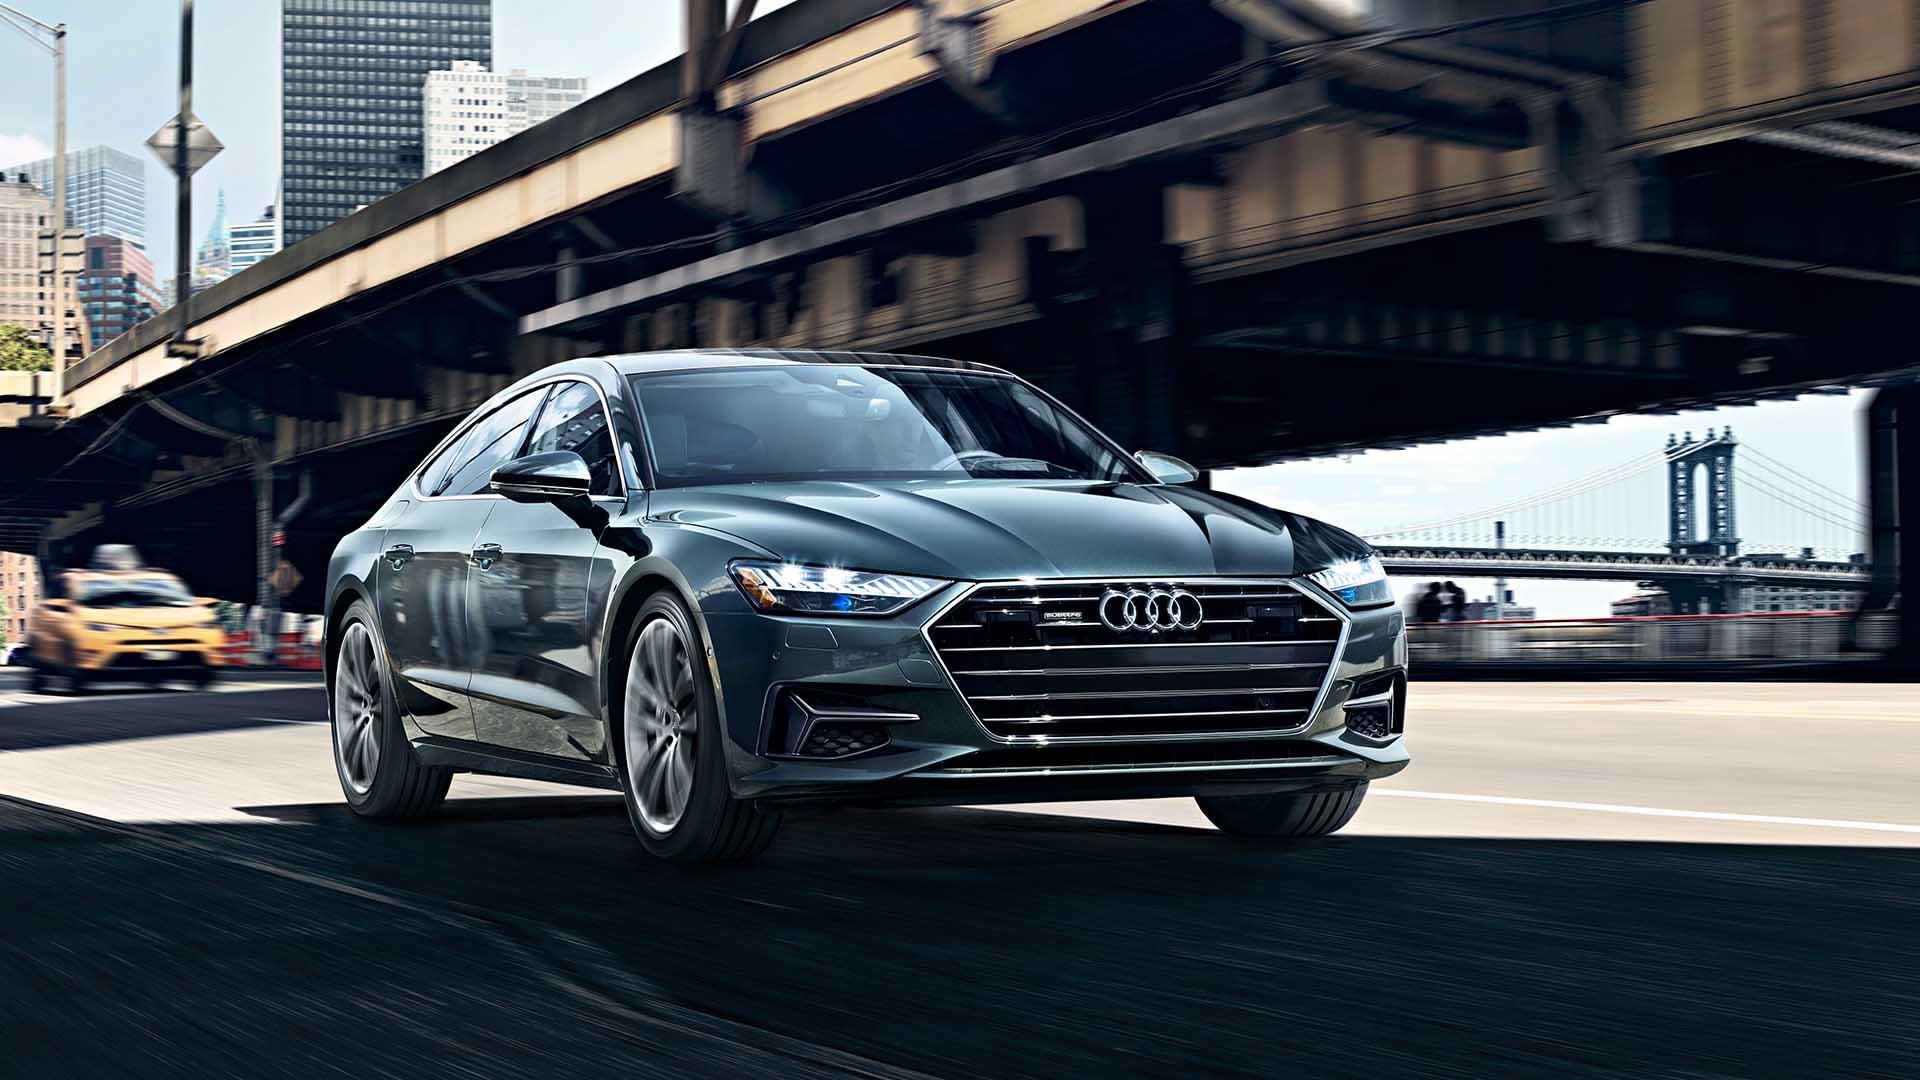 Kekurangan Audi A7 Tangguh